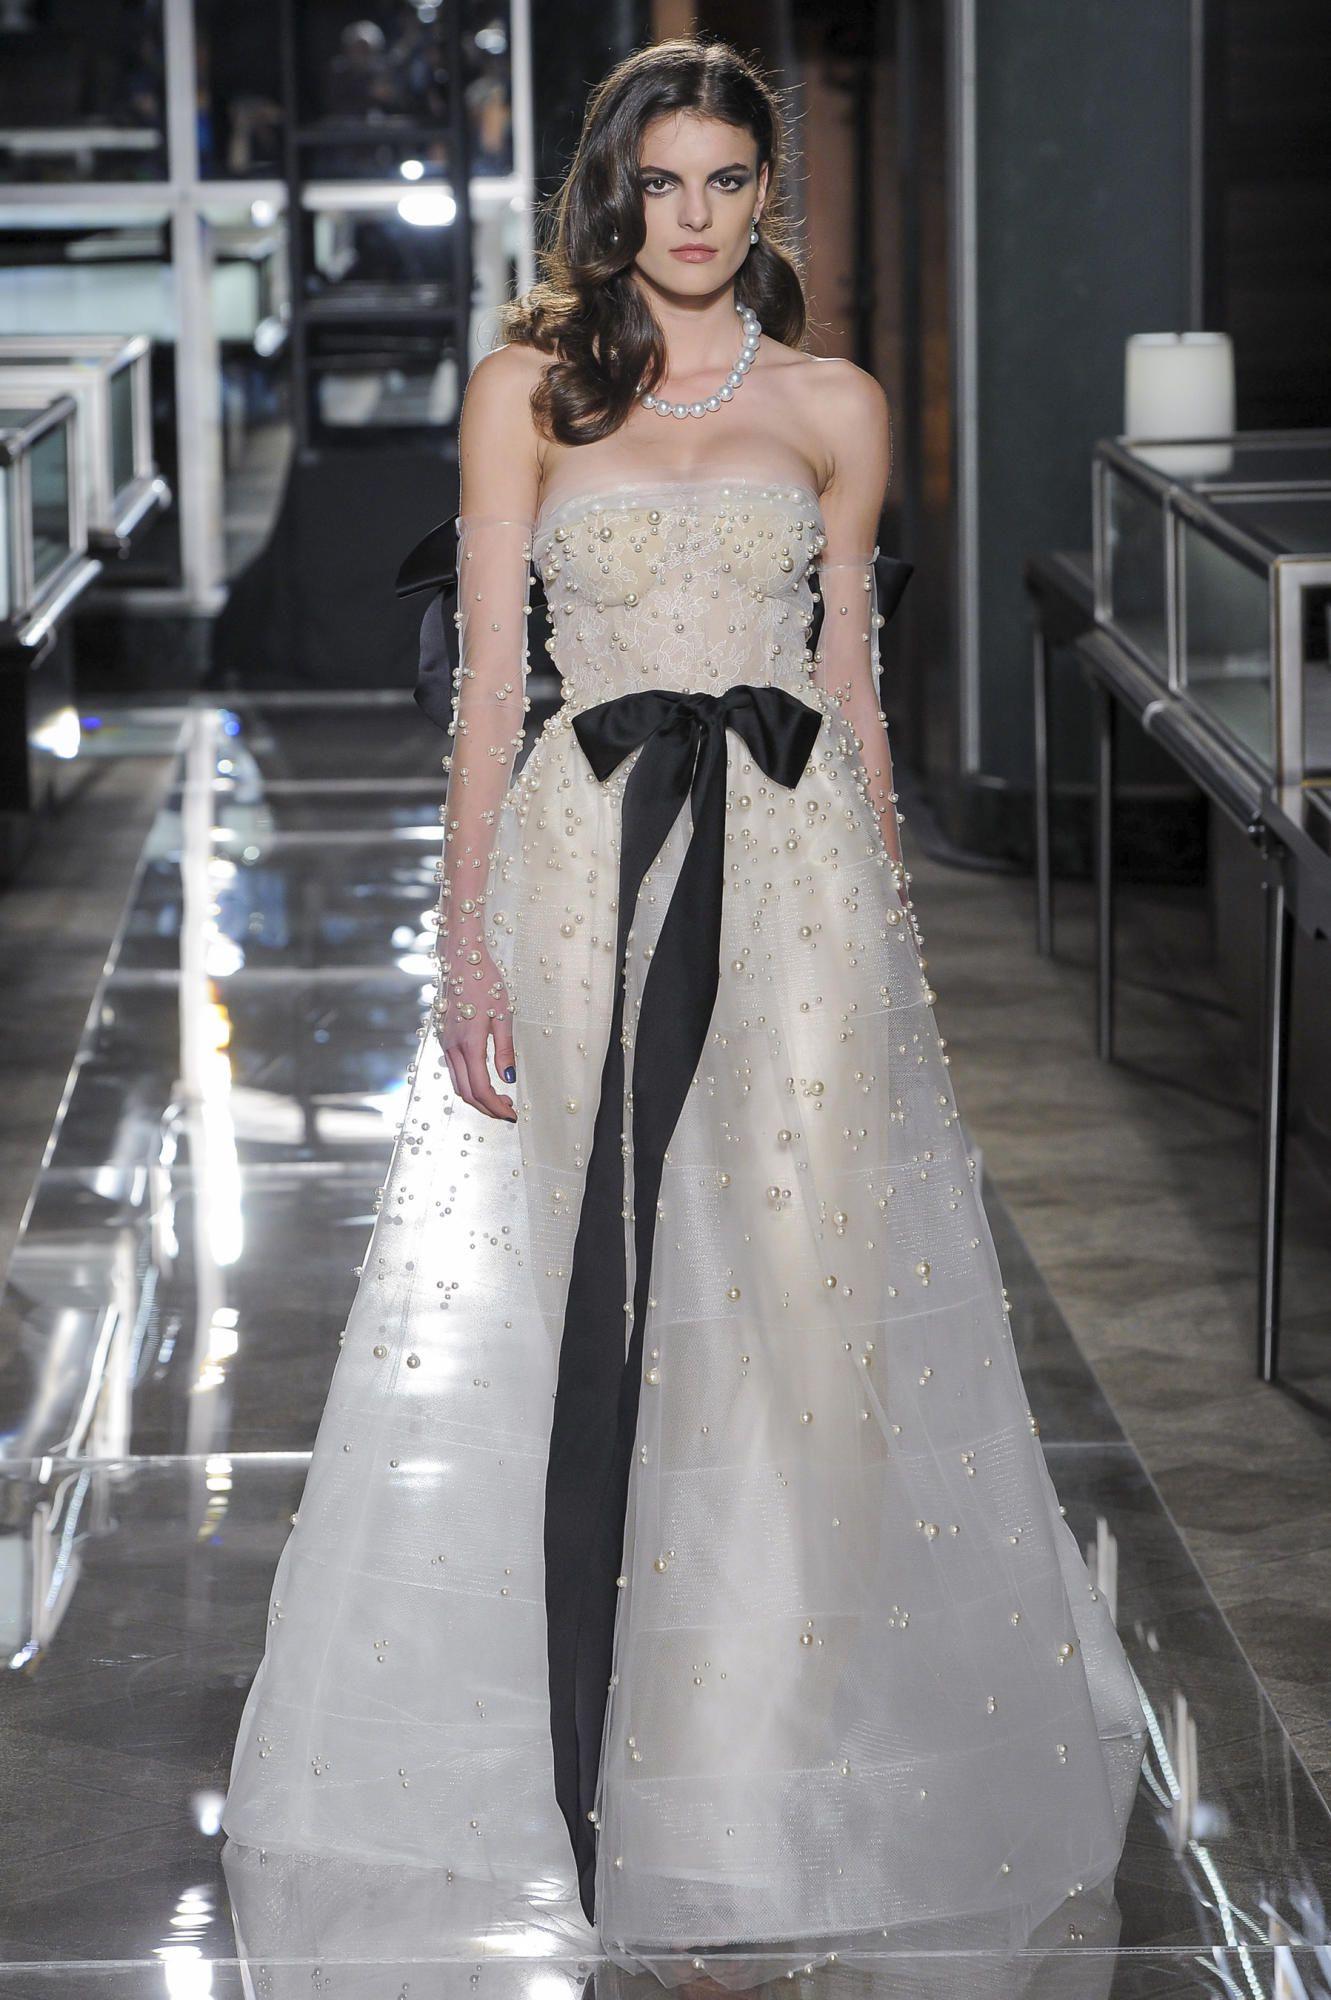 reem-acra-spring-2018-pearl-gown Tendências de vestidos de noiva para 2018